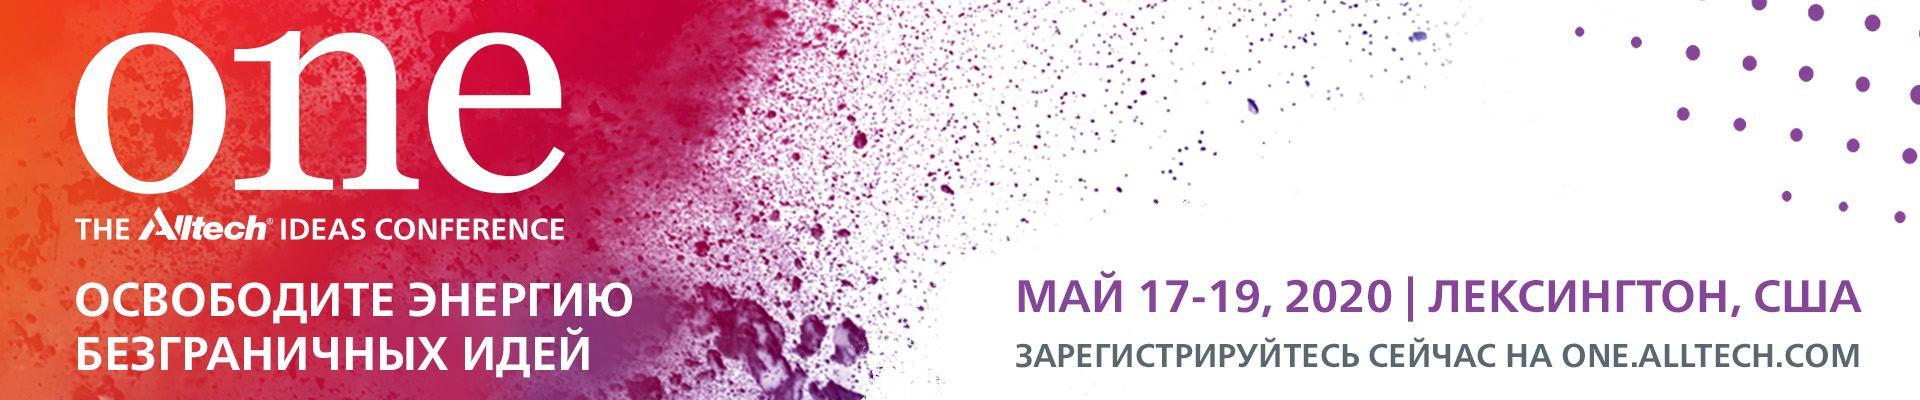 ONE: Конференция идей Alltech